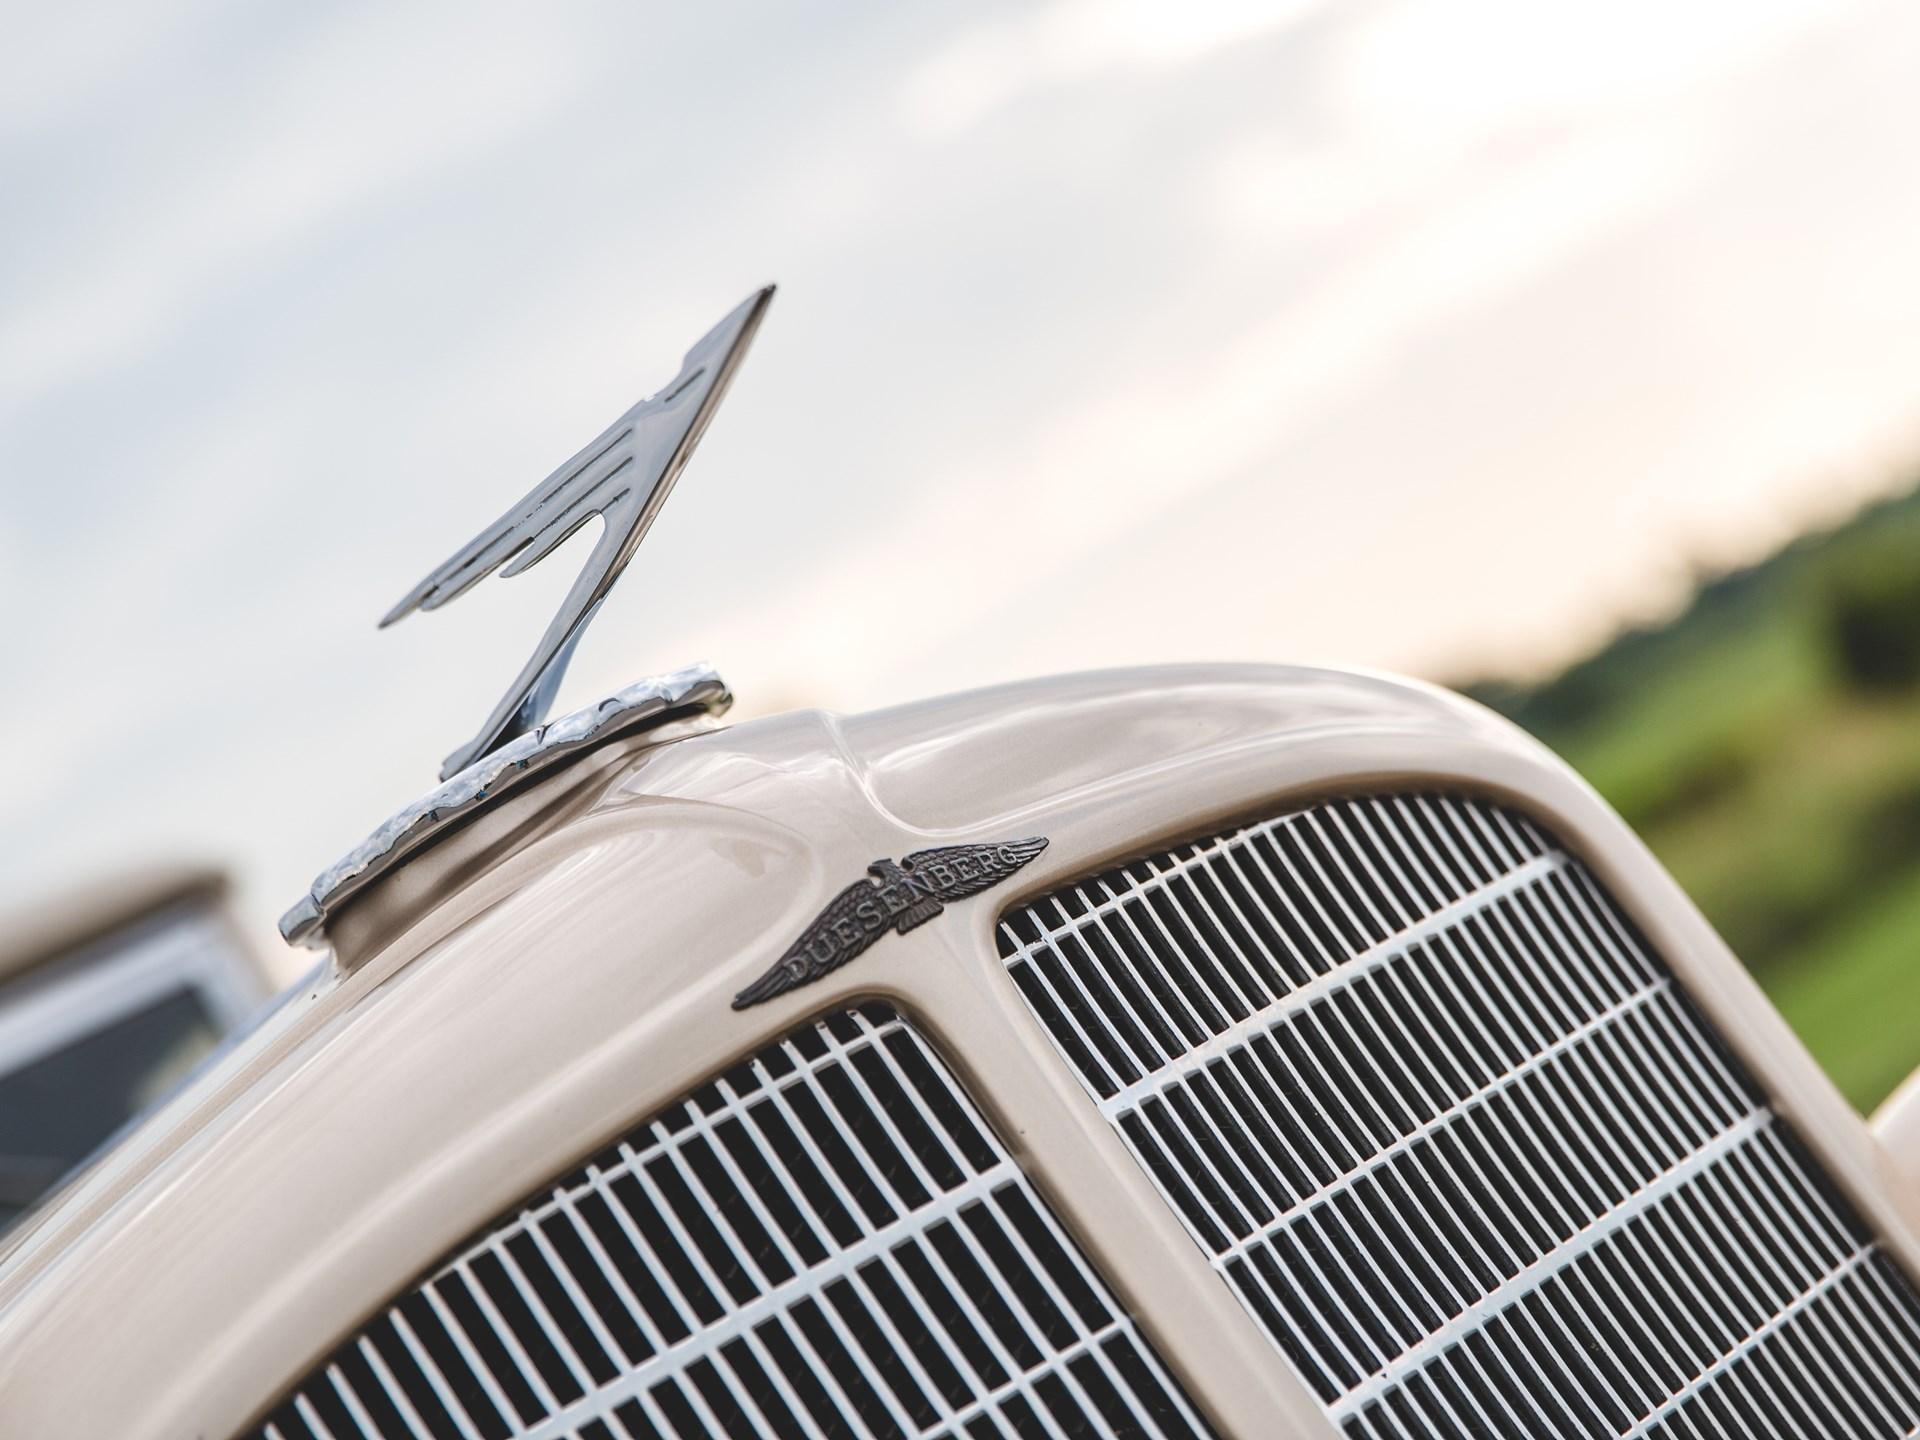 1929 Duesenberg Model J Sedan by Derham/Bohman & Schwartz